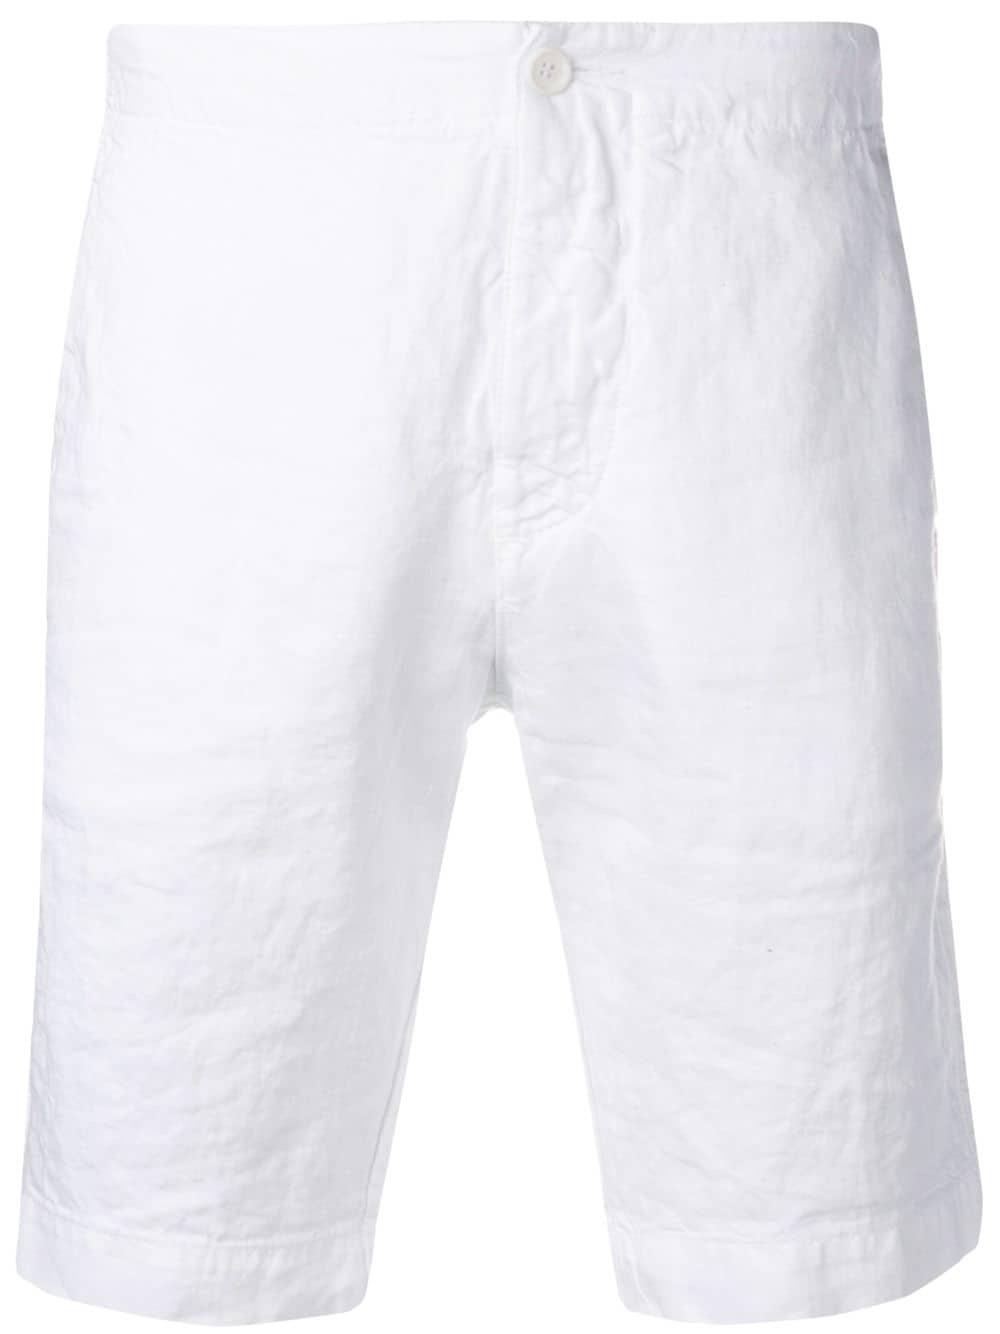 COTTON SHORT ASPESI | Shorts | CQ21 C25385072